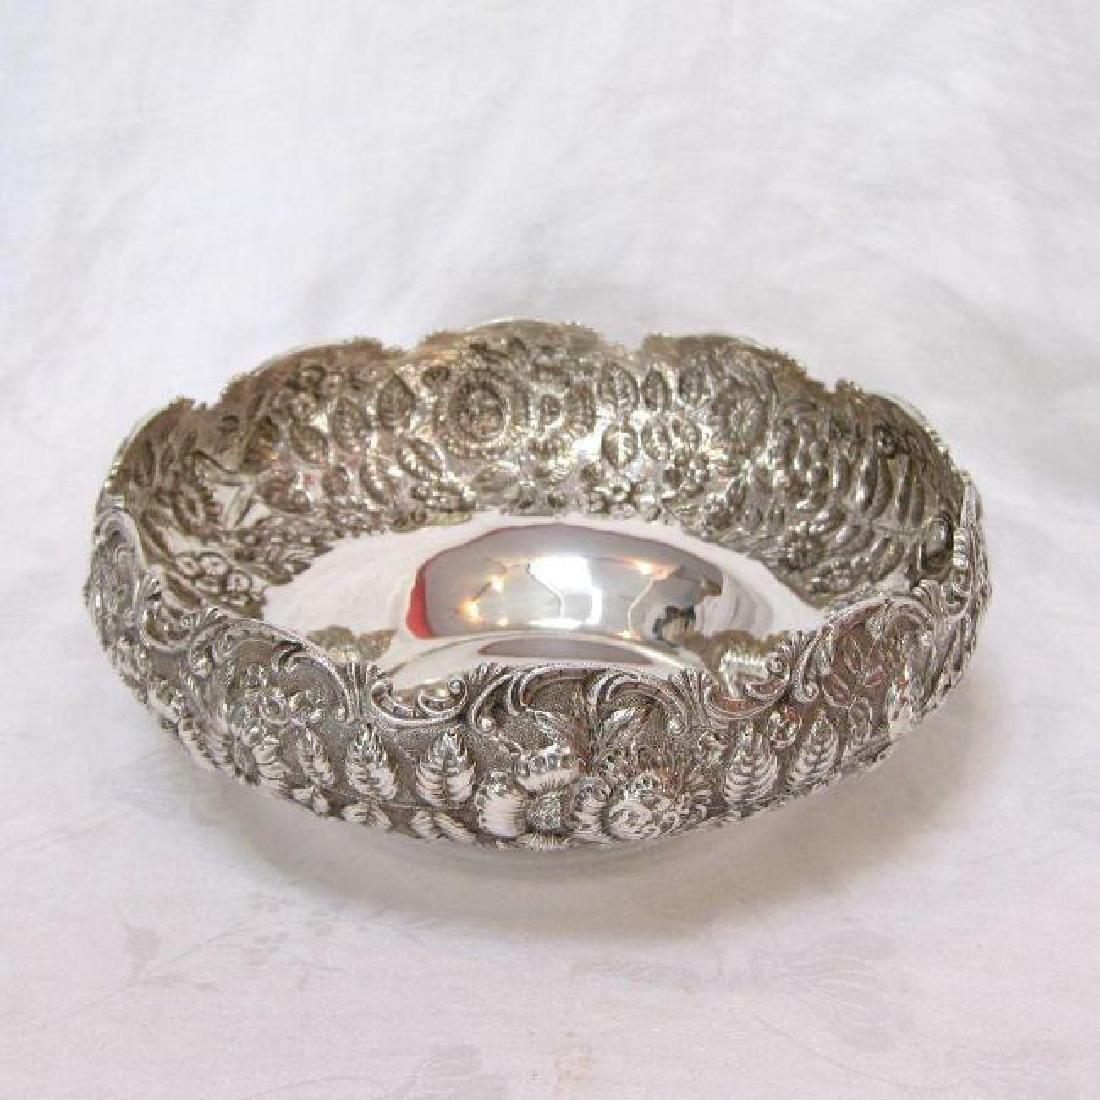 Antique Kirk & Son Sterling Silver Floral Repousse Bowl - 4